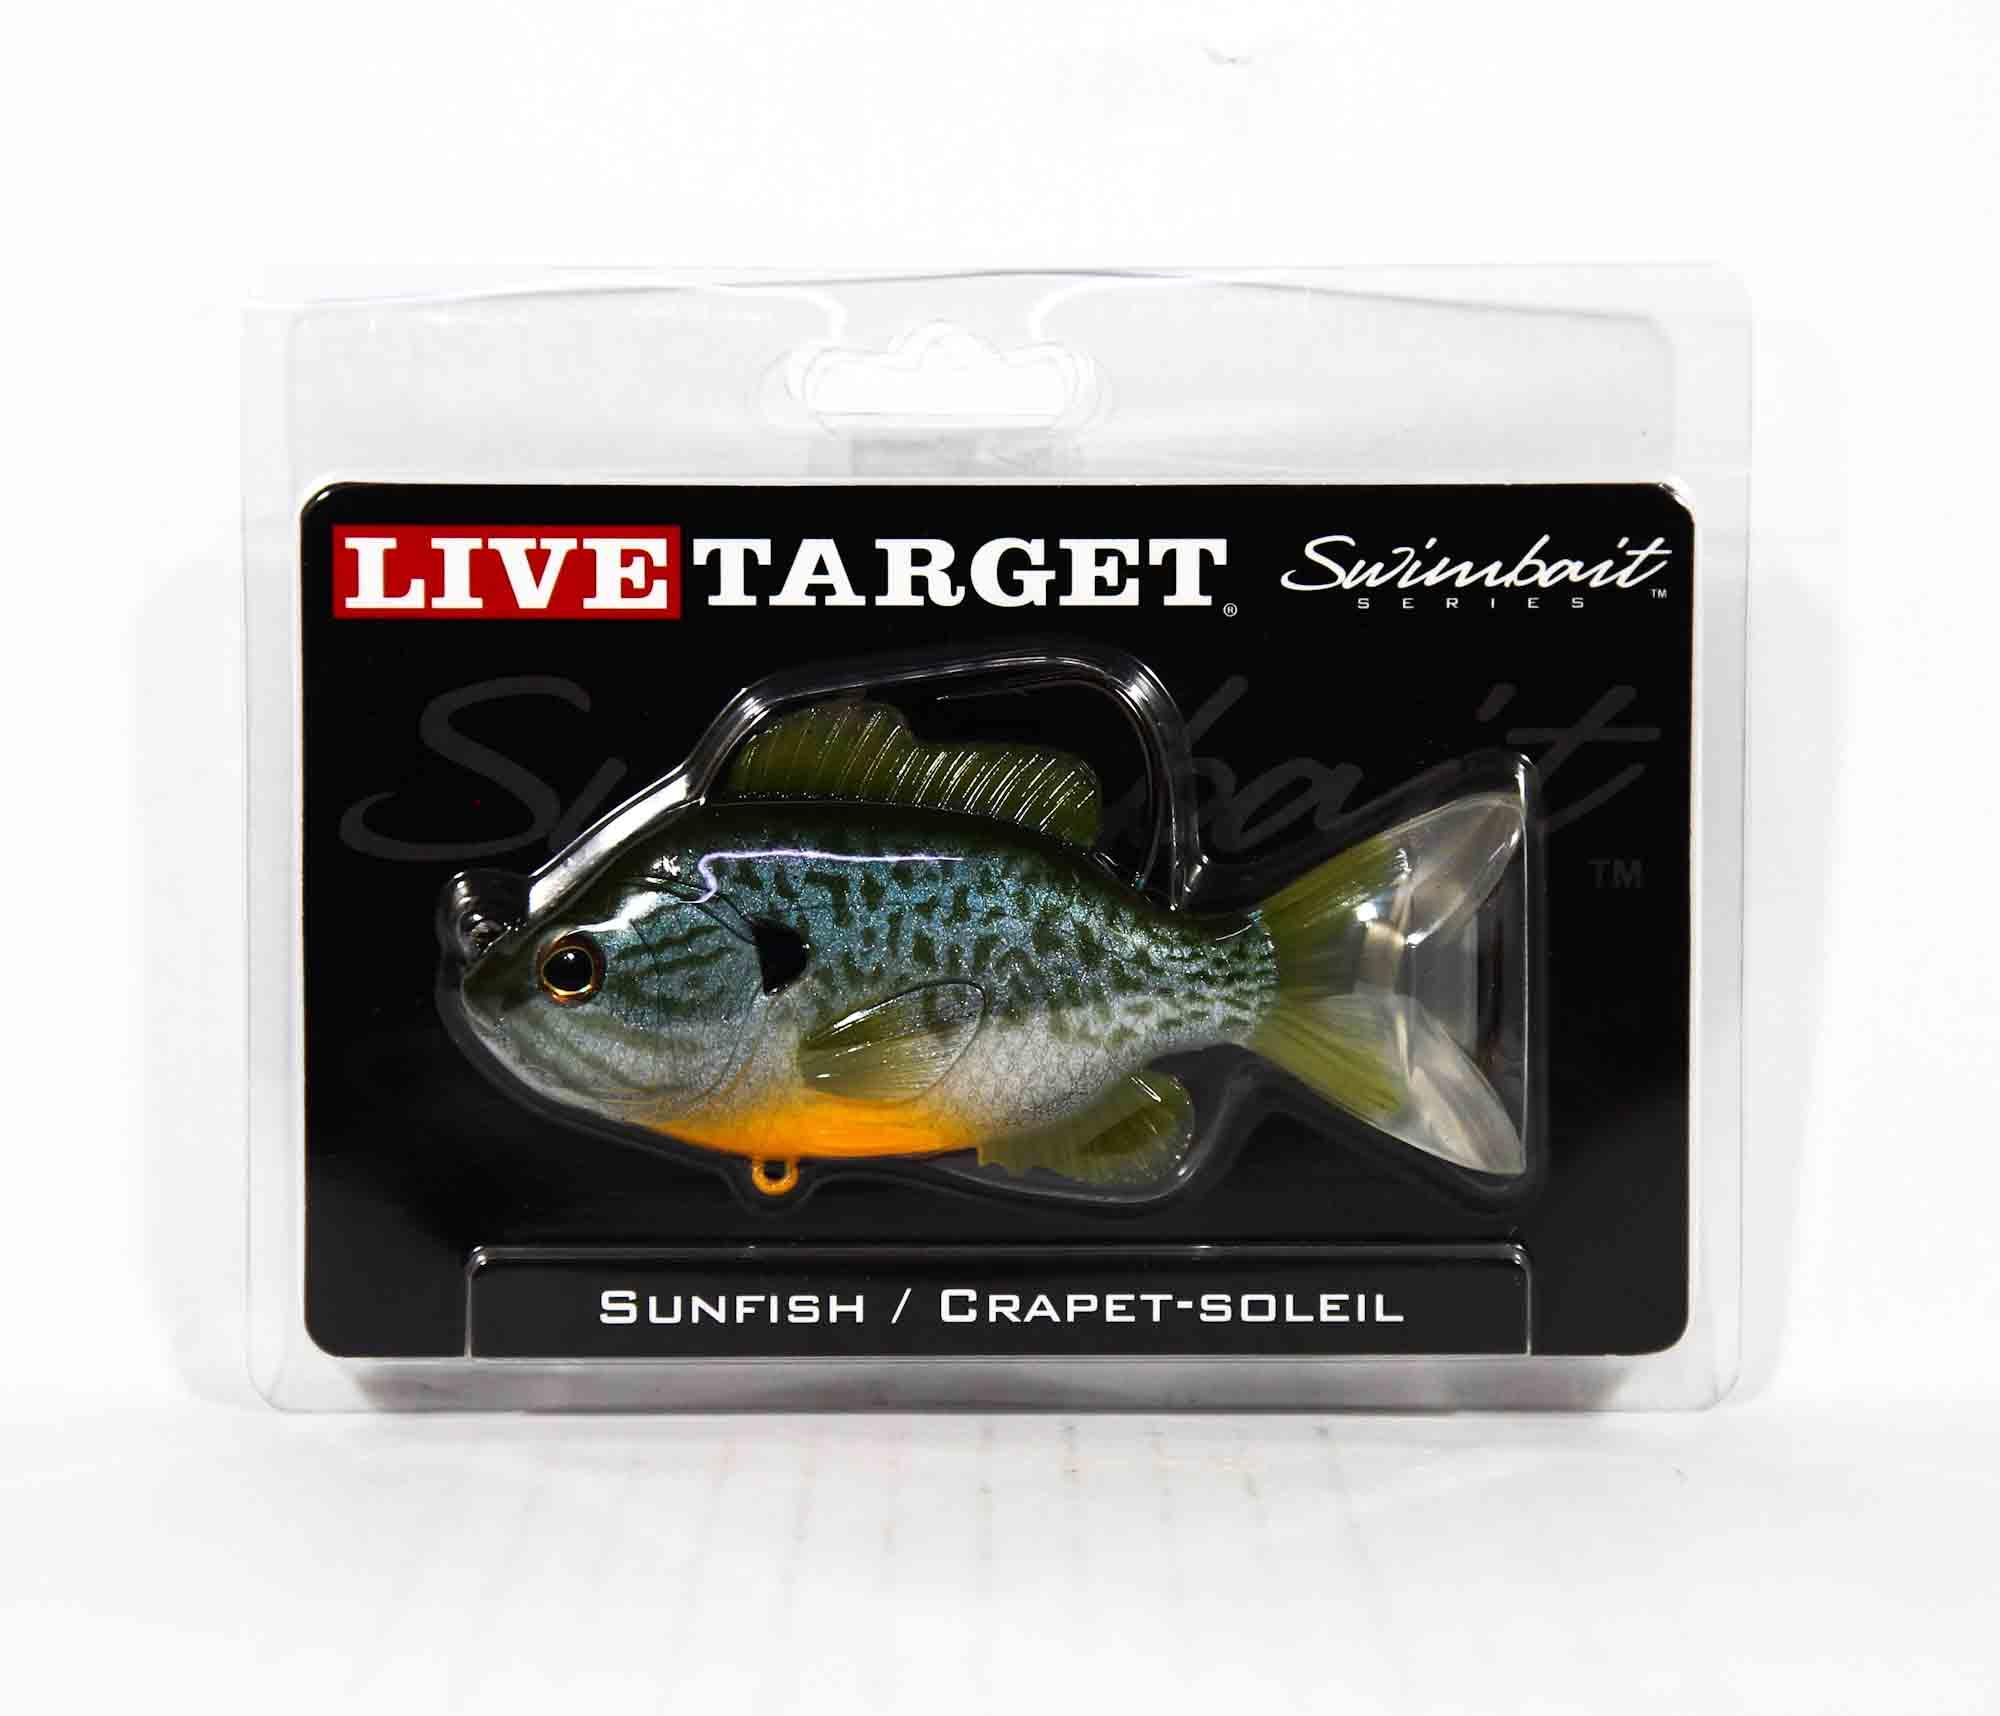 Live Target SFS110MS551 Swimbait Sunfish 4.75 Inch N Blue Pumpkinseed (0620)